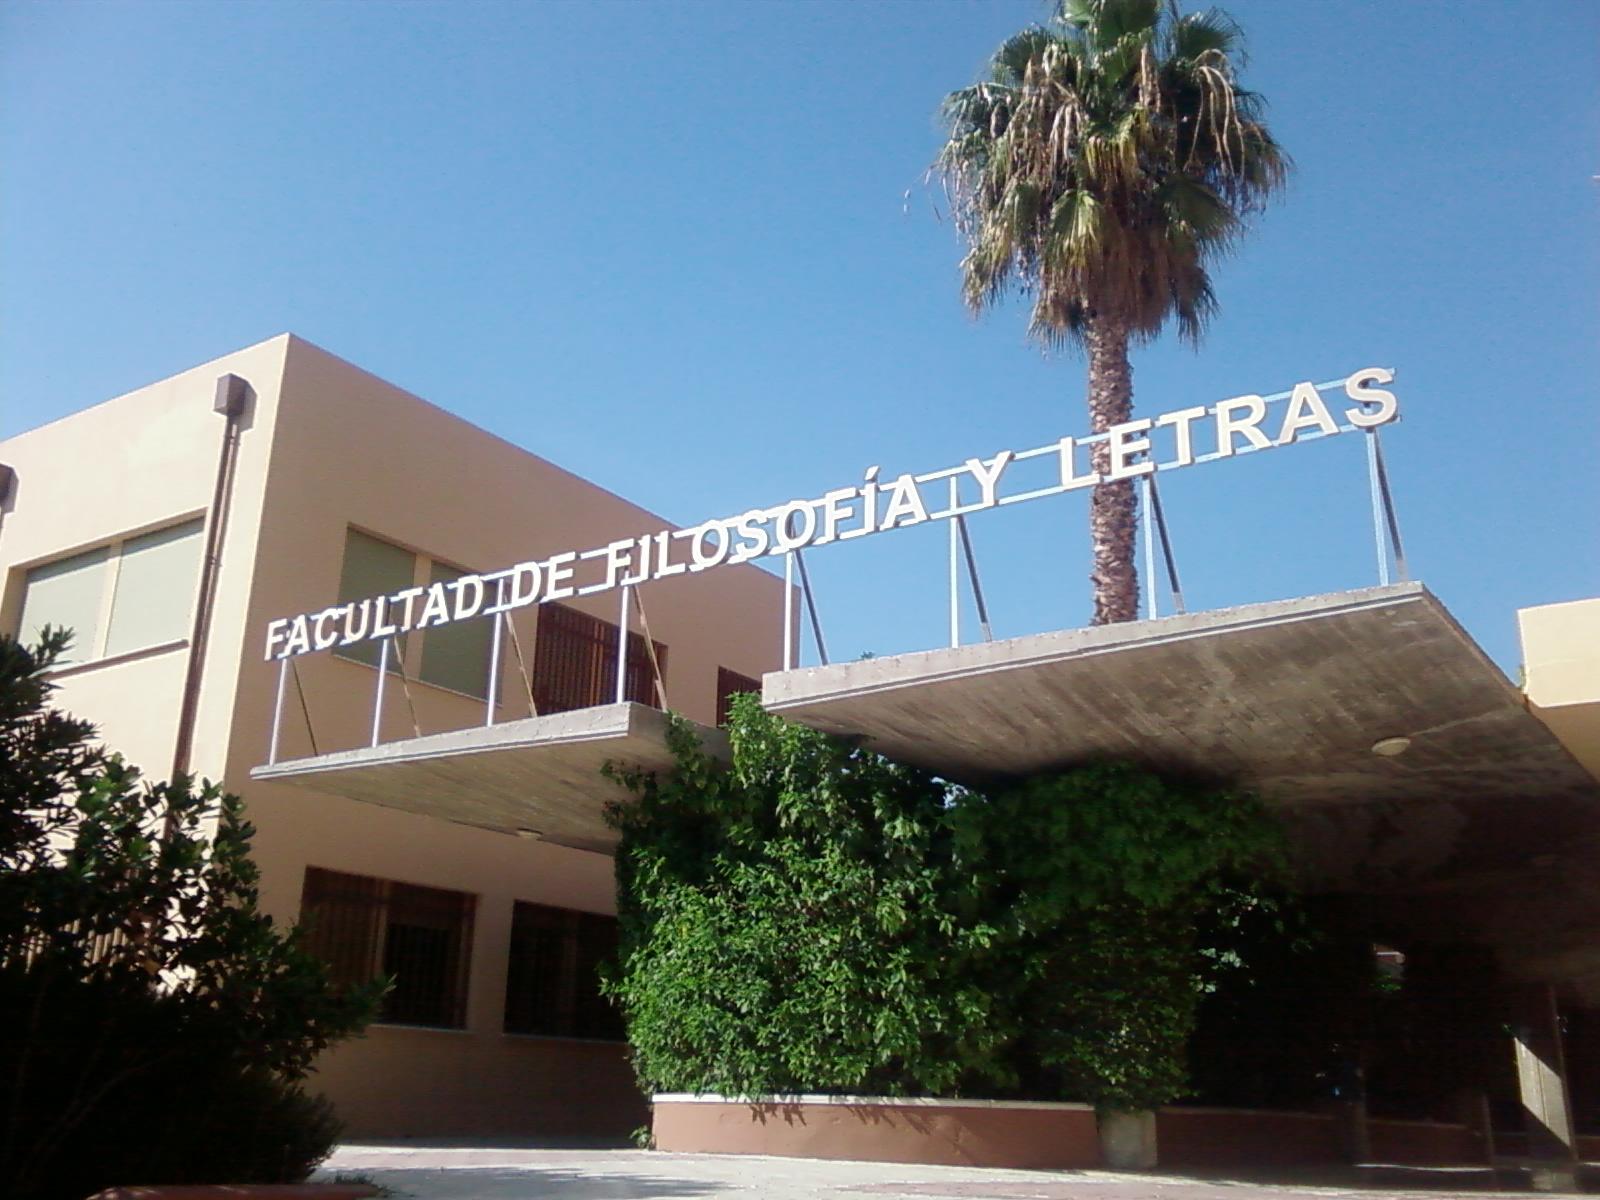 Archivo Facultad De Filosofia Y Letras Uma 3 Jpg Wikipedia La